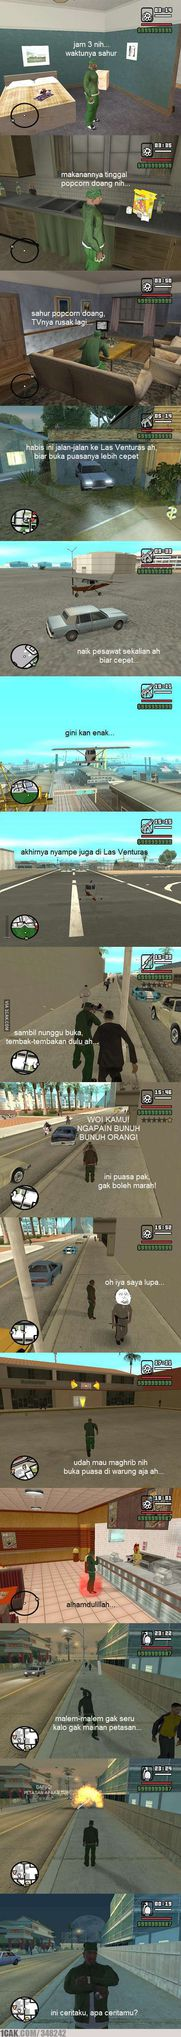 [Story of CJ - Ramadhan Edition] WOW nya gan !!!